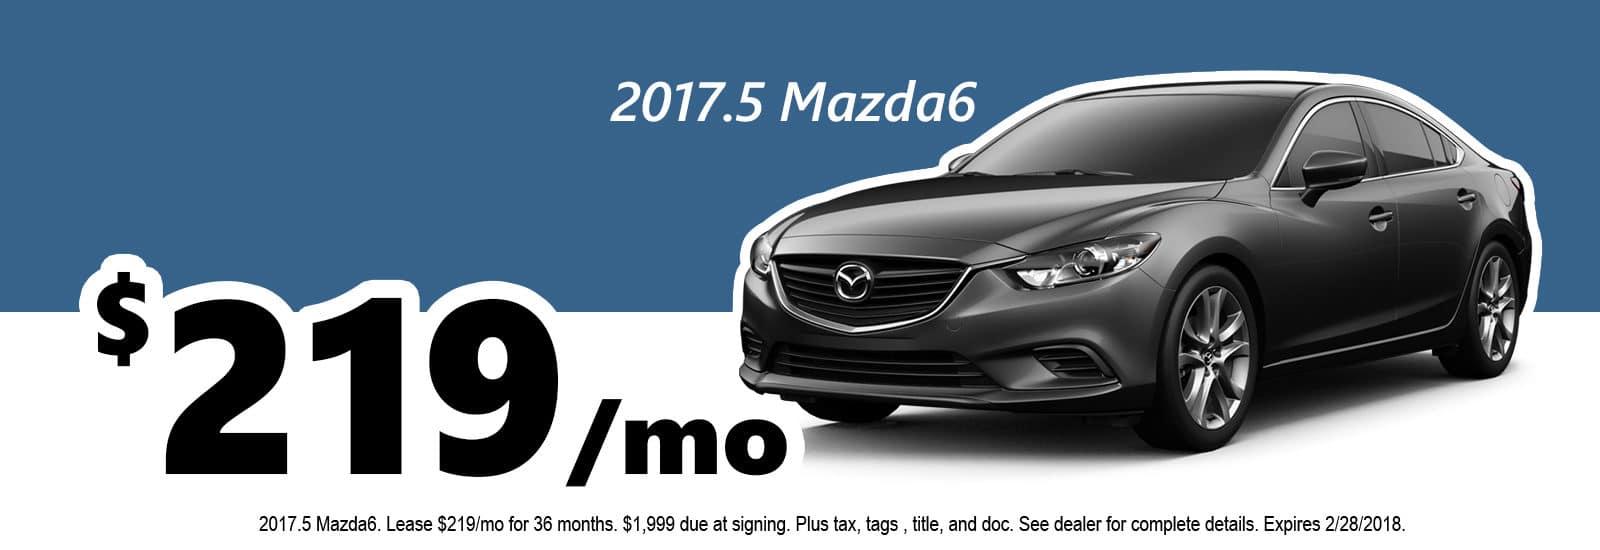 Mazda Dealer In Indianapolis Ray Skillman Westside Mazda - Mazda dealers massachusetts